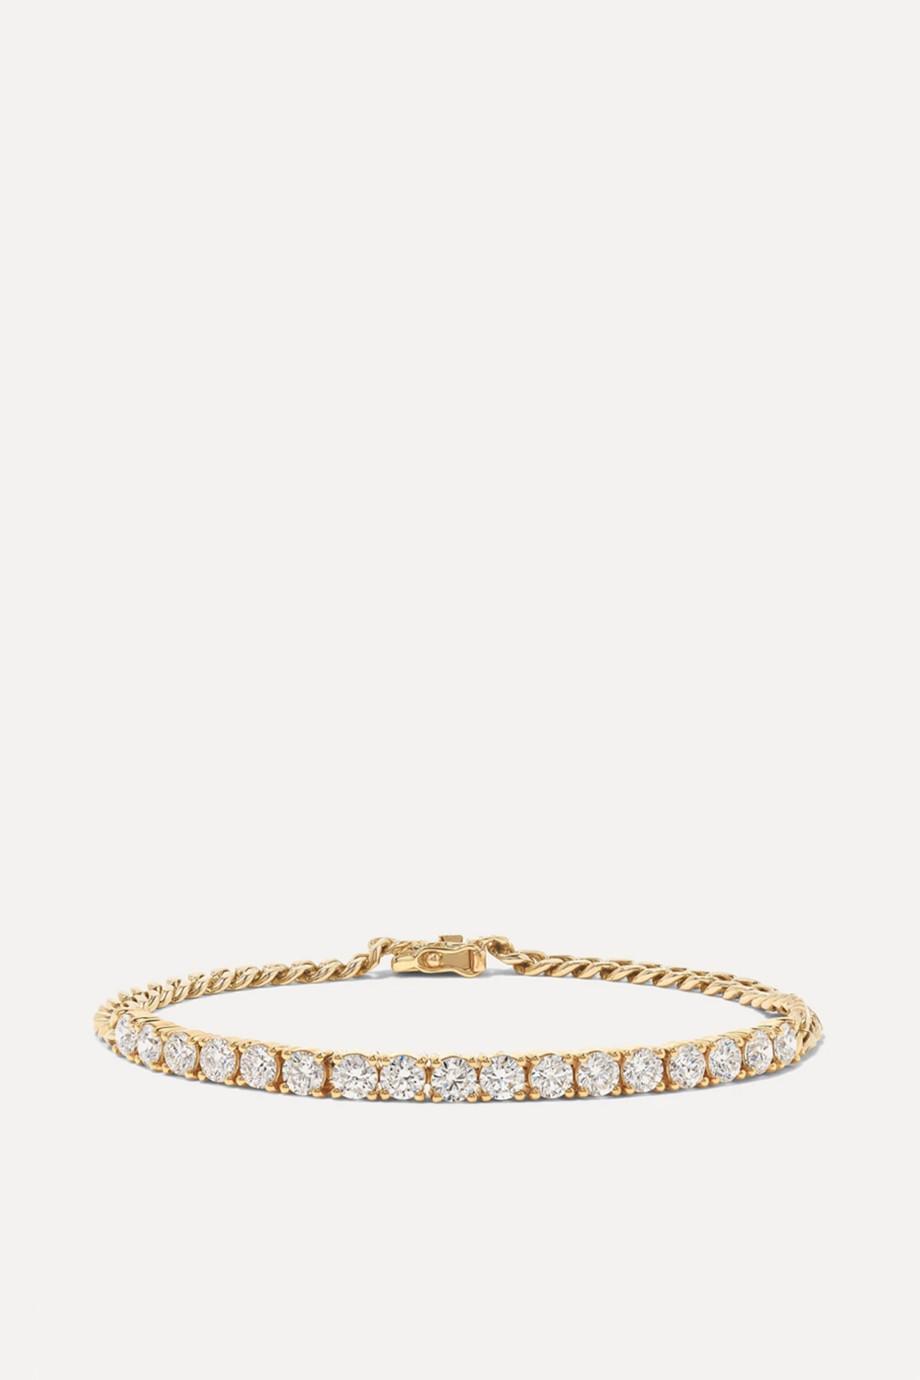 Anita Ko Bracelet en or 18 carats et diamants